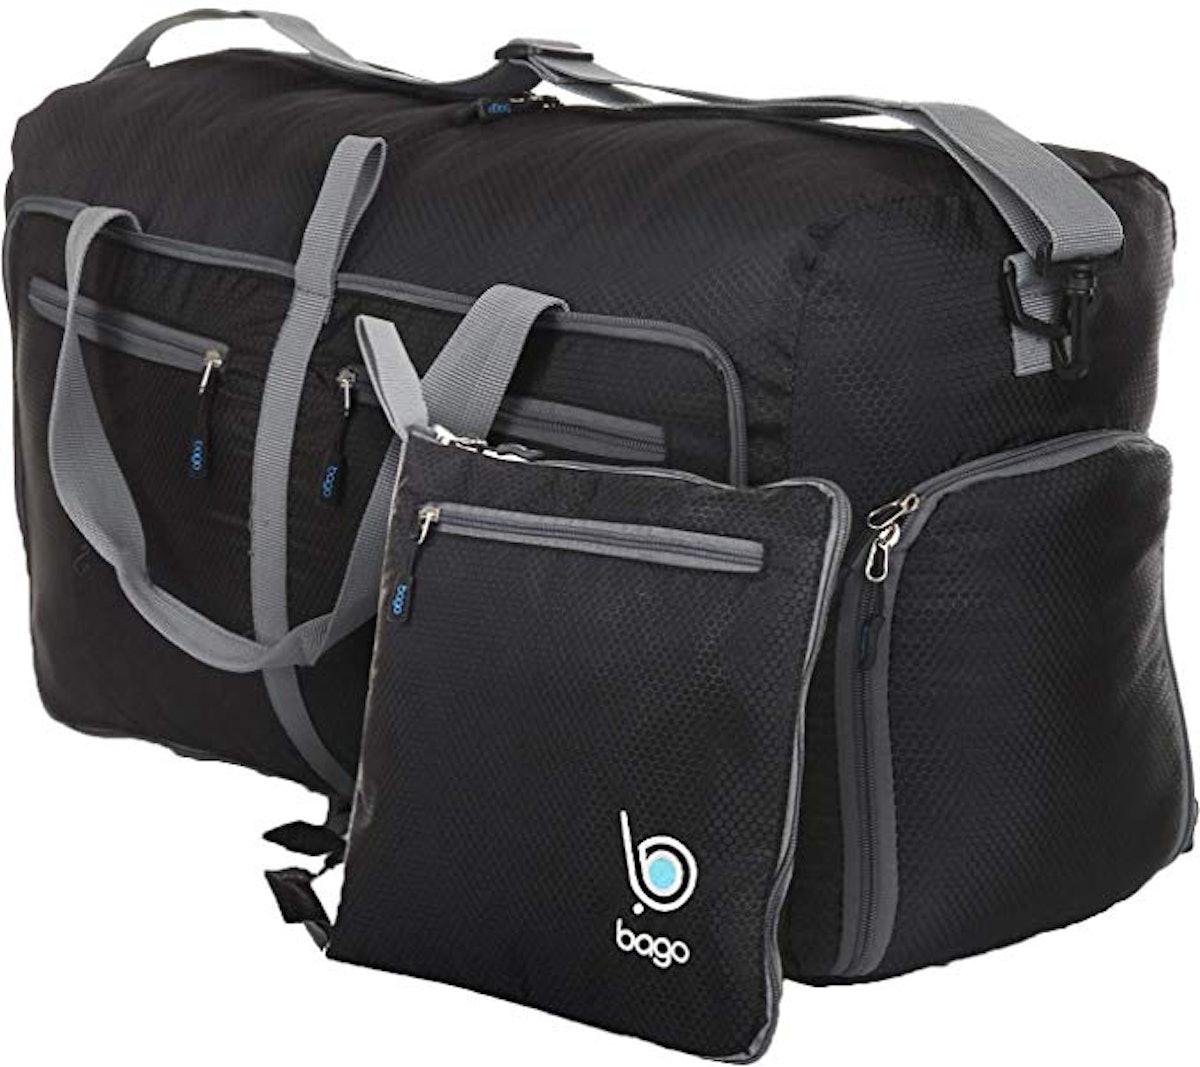 "Bago 27"" Duffle Bag for Men And Women"